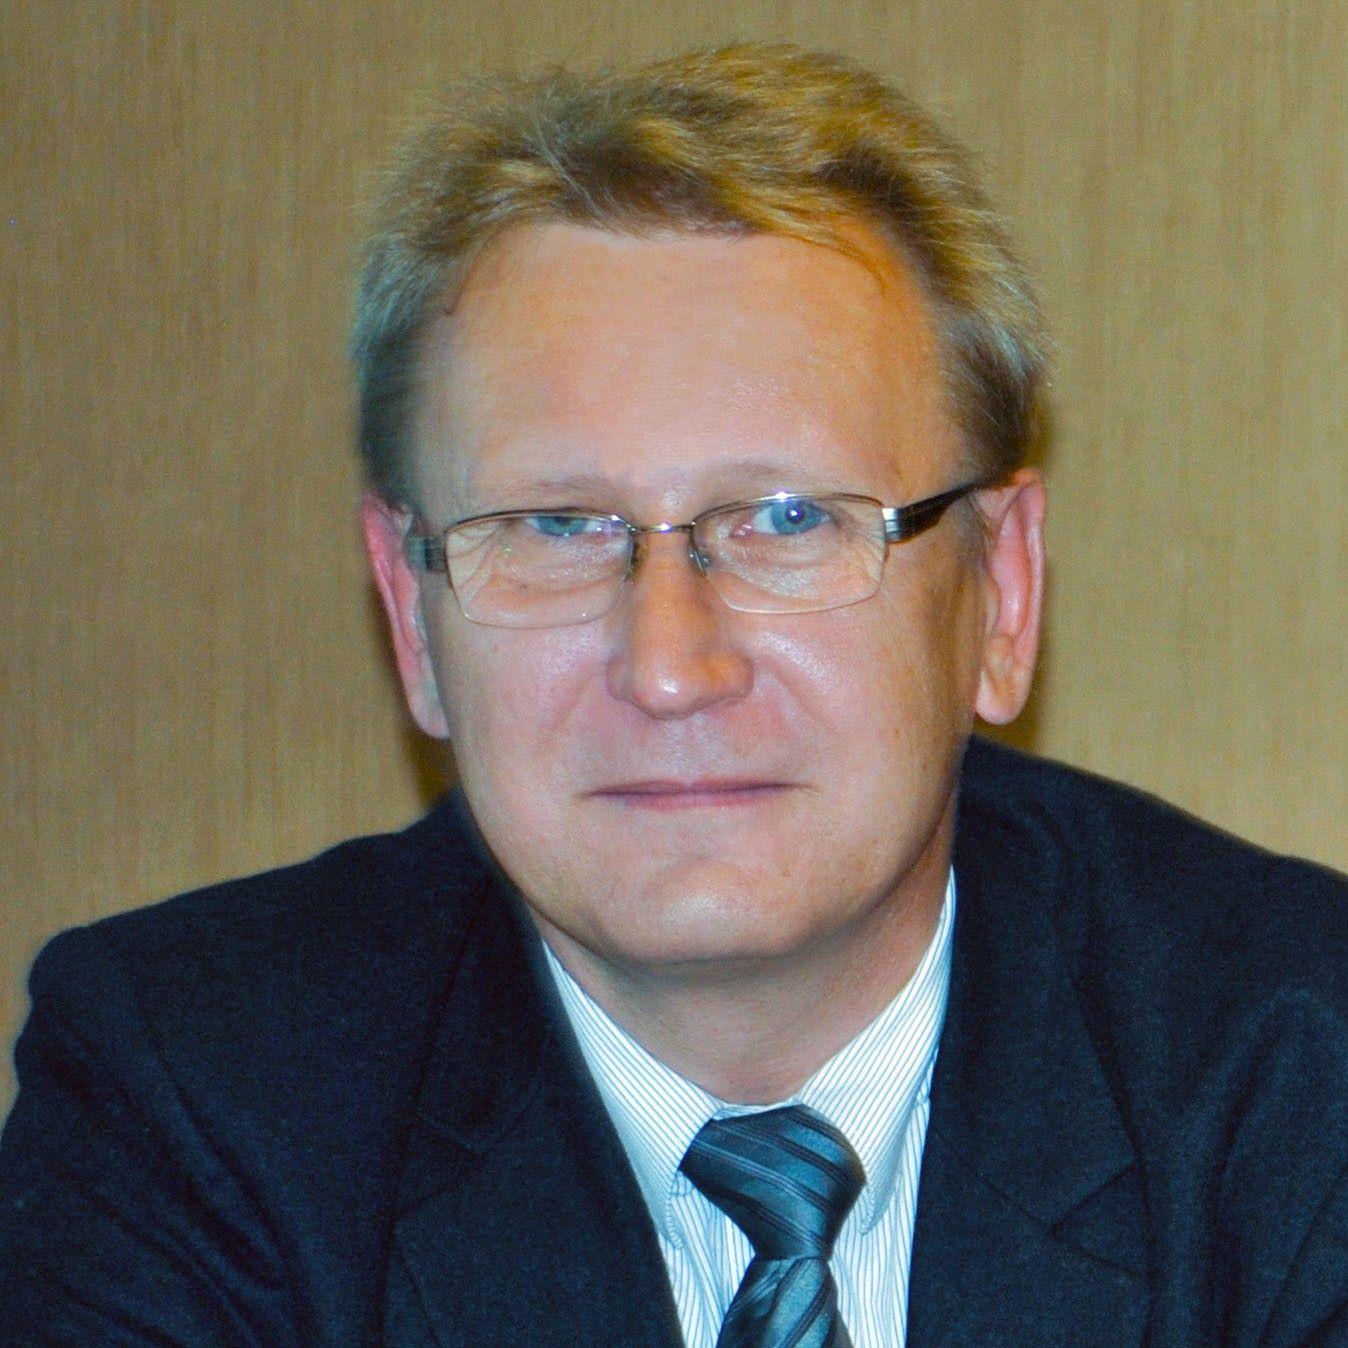 Marek H. Kotlarz